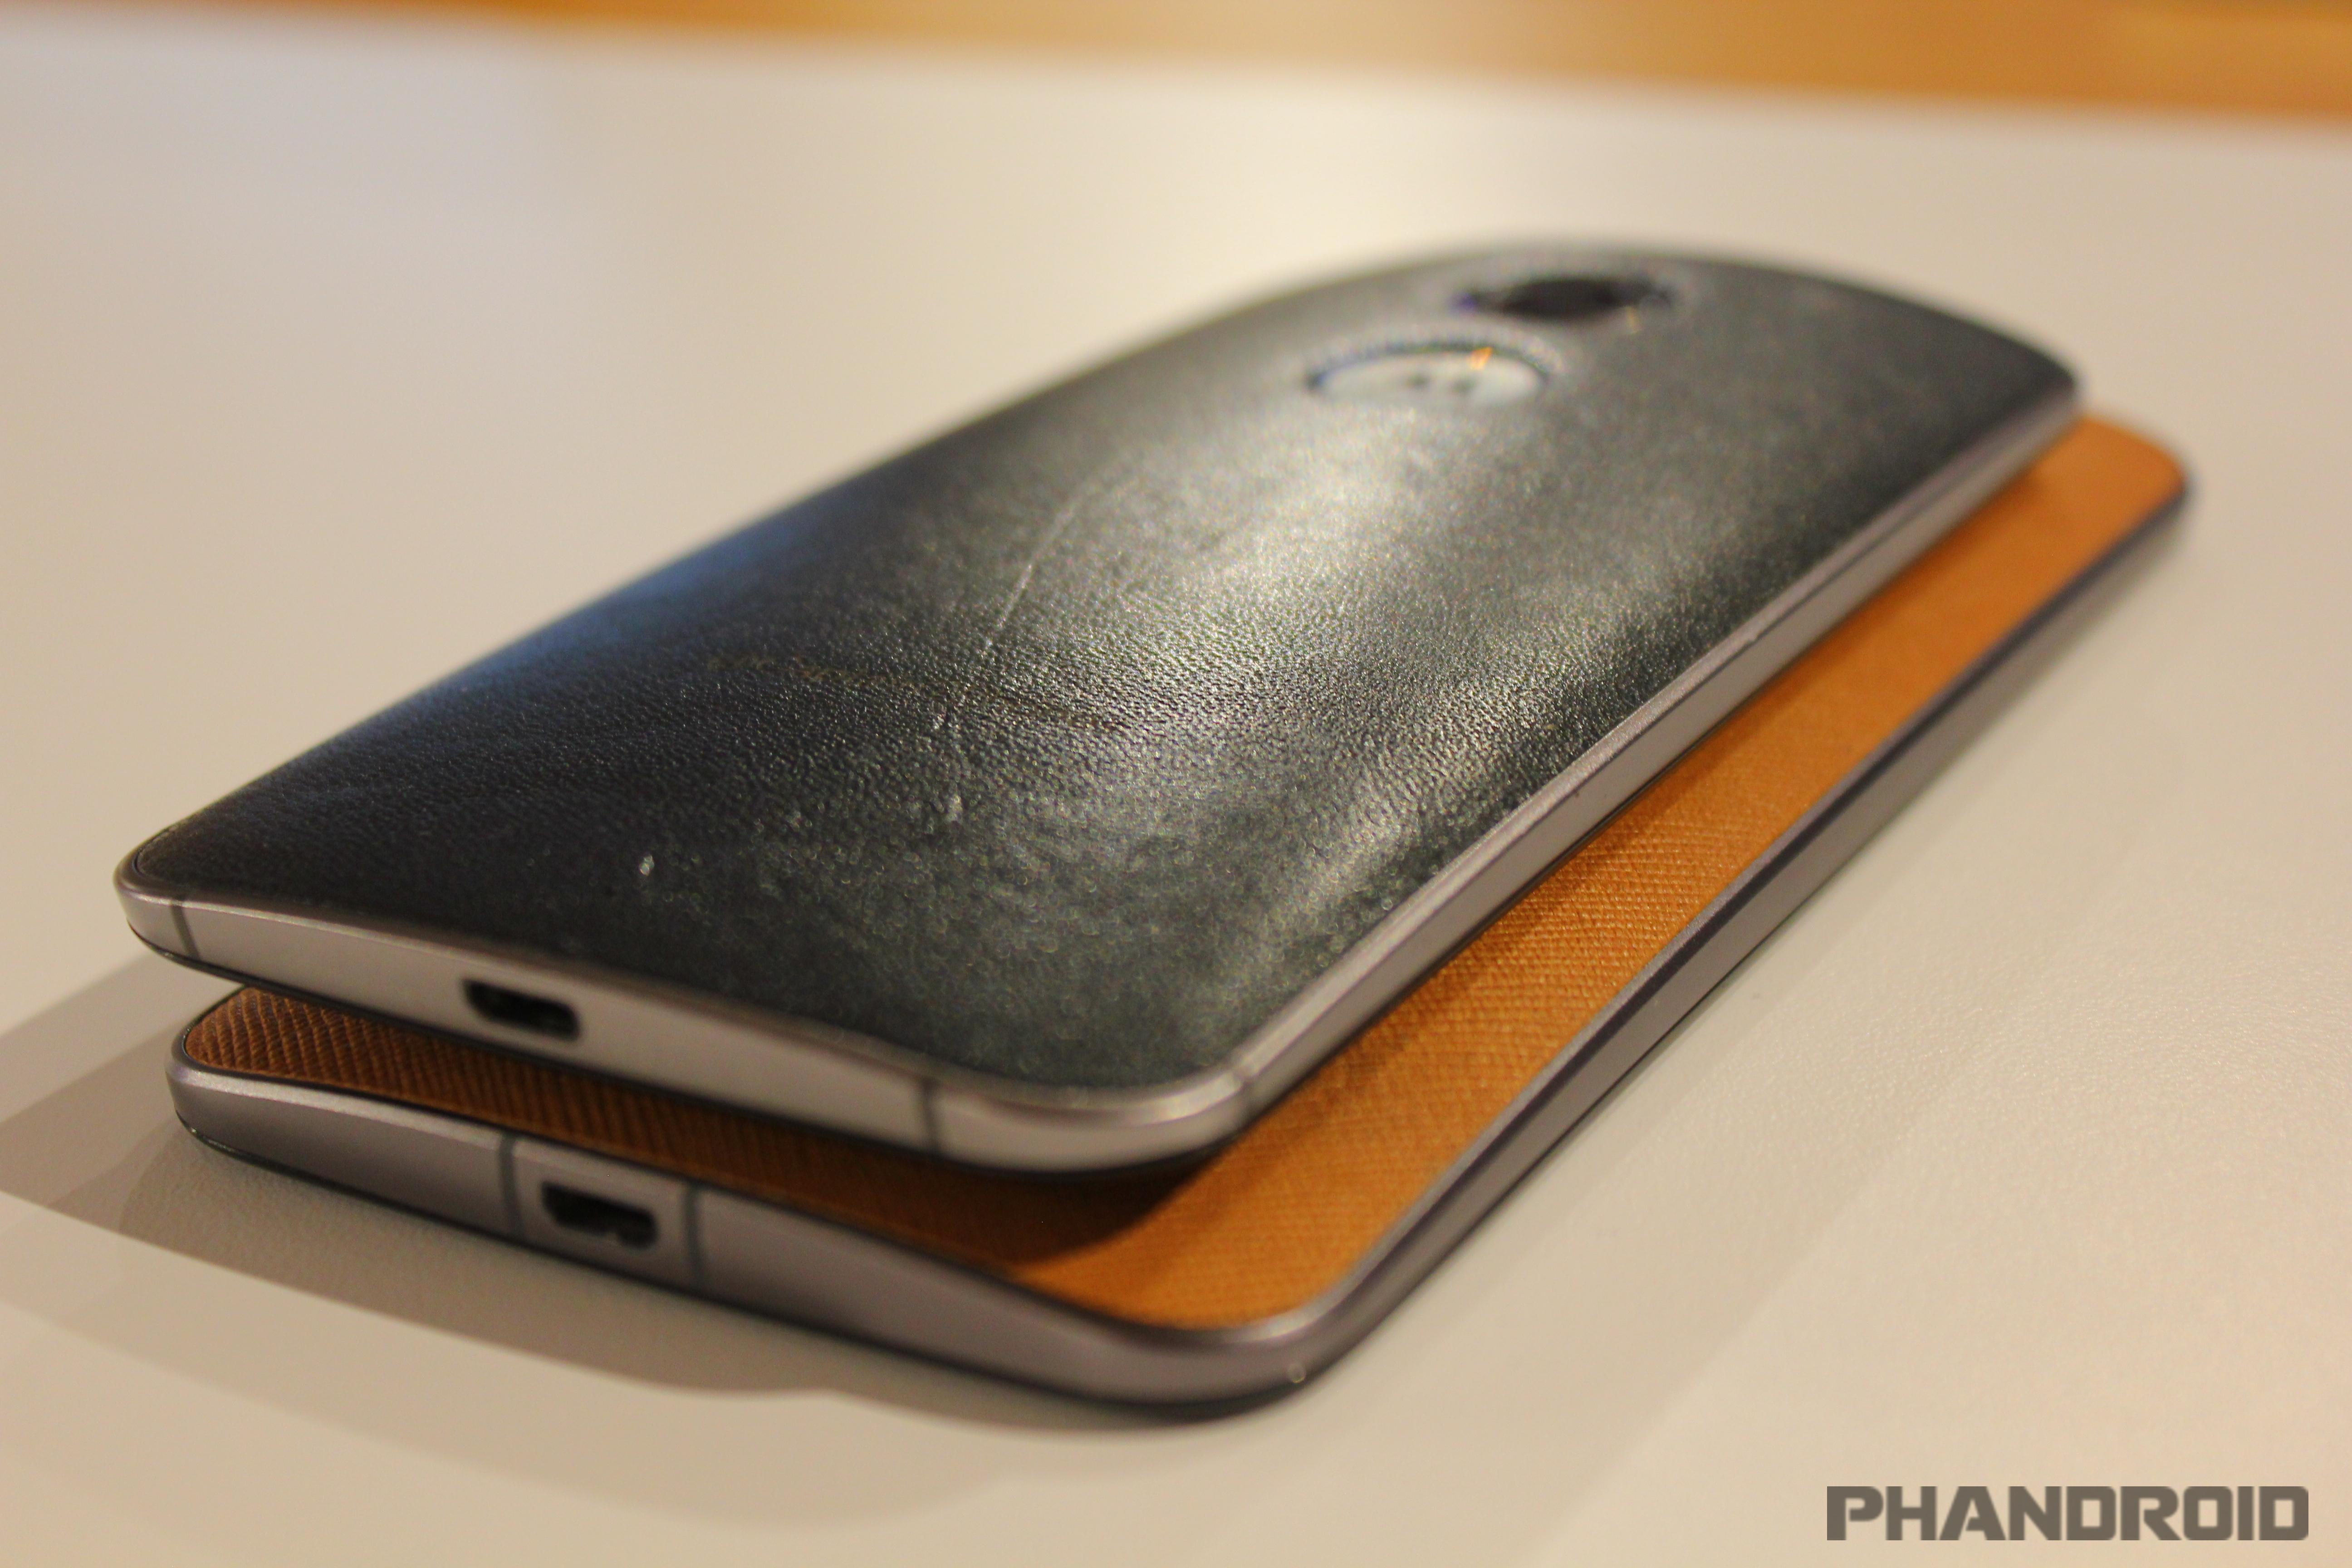 Moto X Style vs iPhone 6 vs Galaxy S6 vs Nexus 6 [CHART]